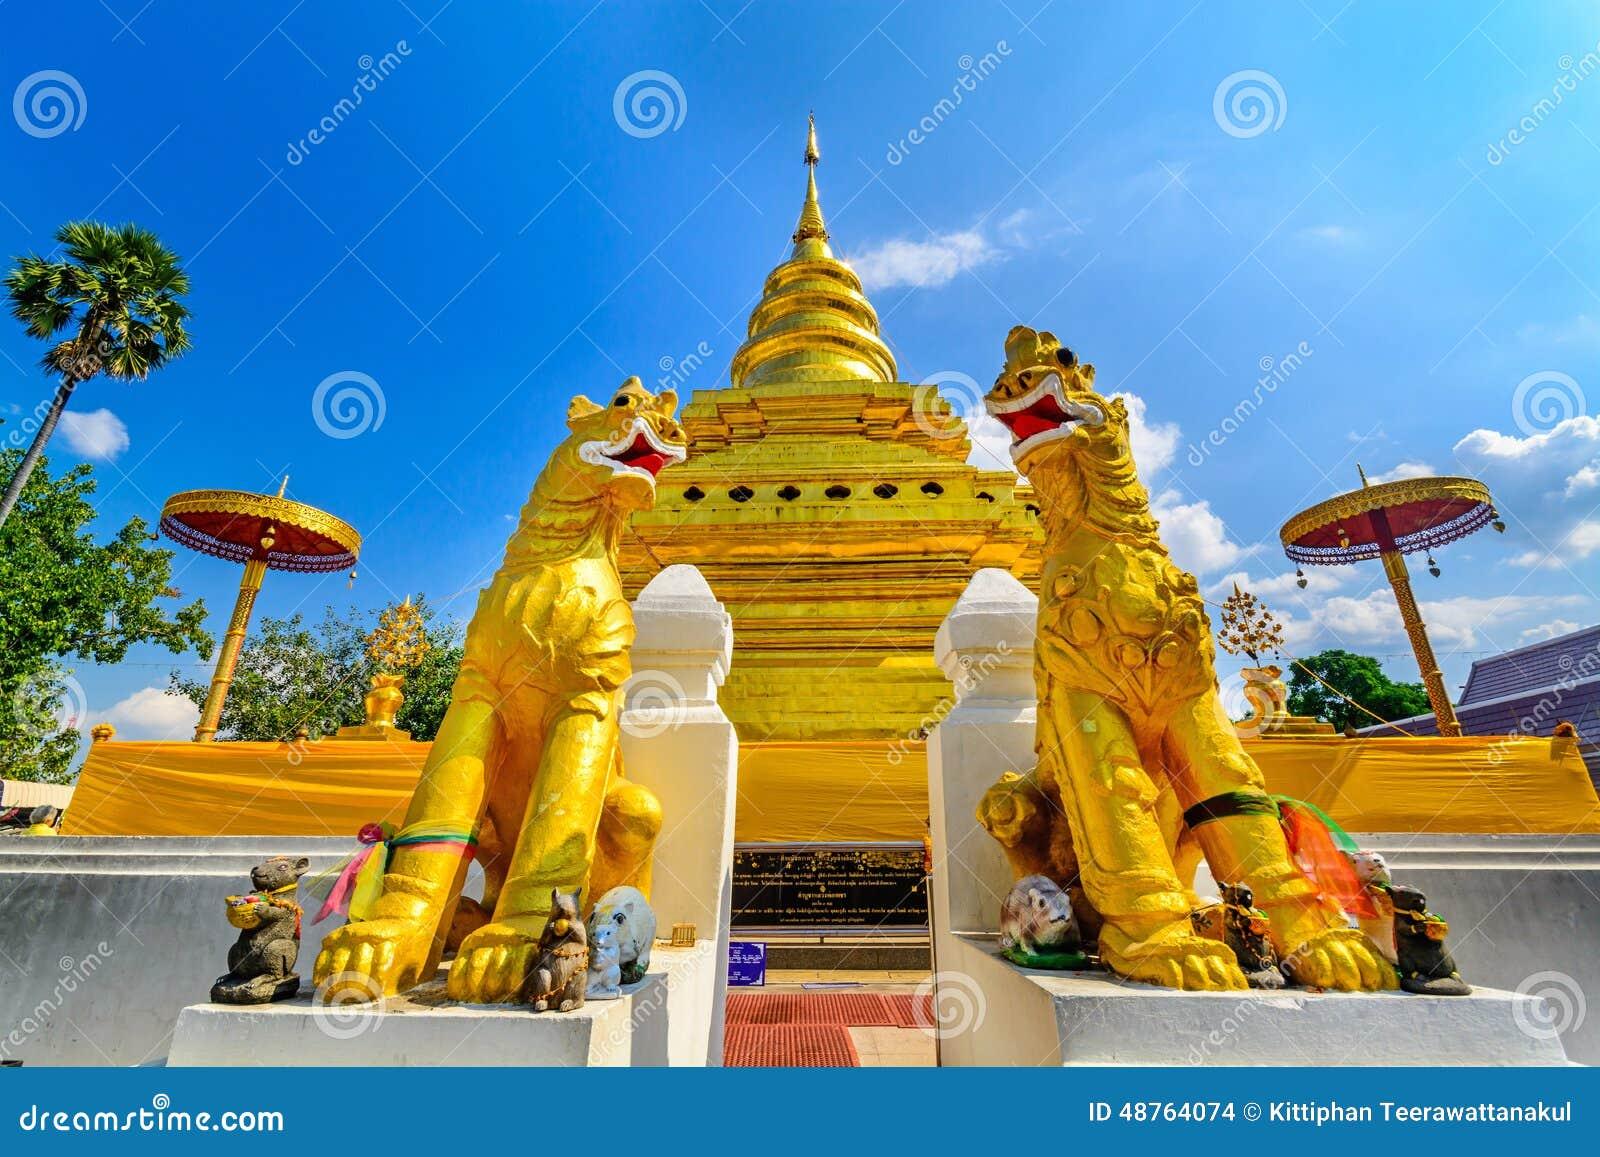 Wat Phra That Sri Chom Thong. Chiang Mai, Thailand Stock ...